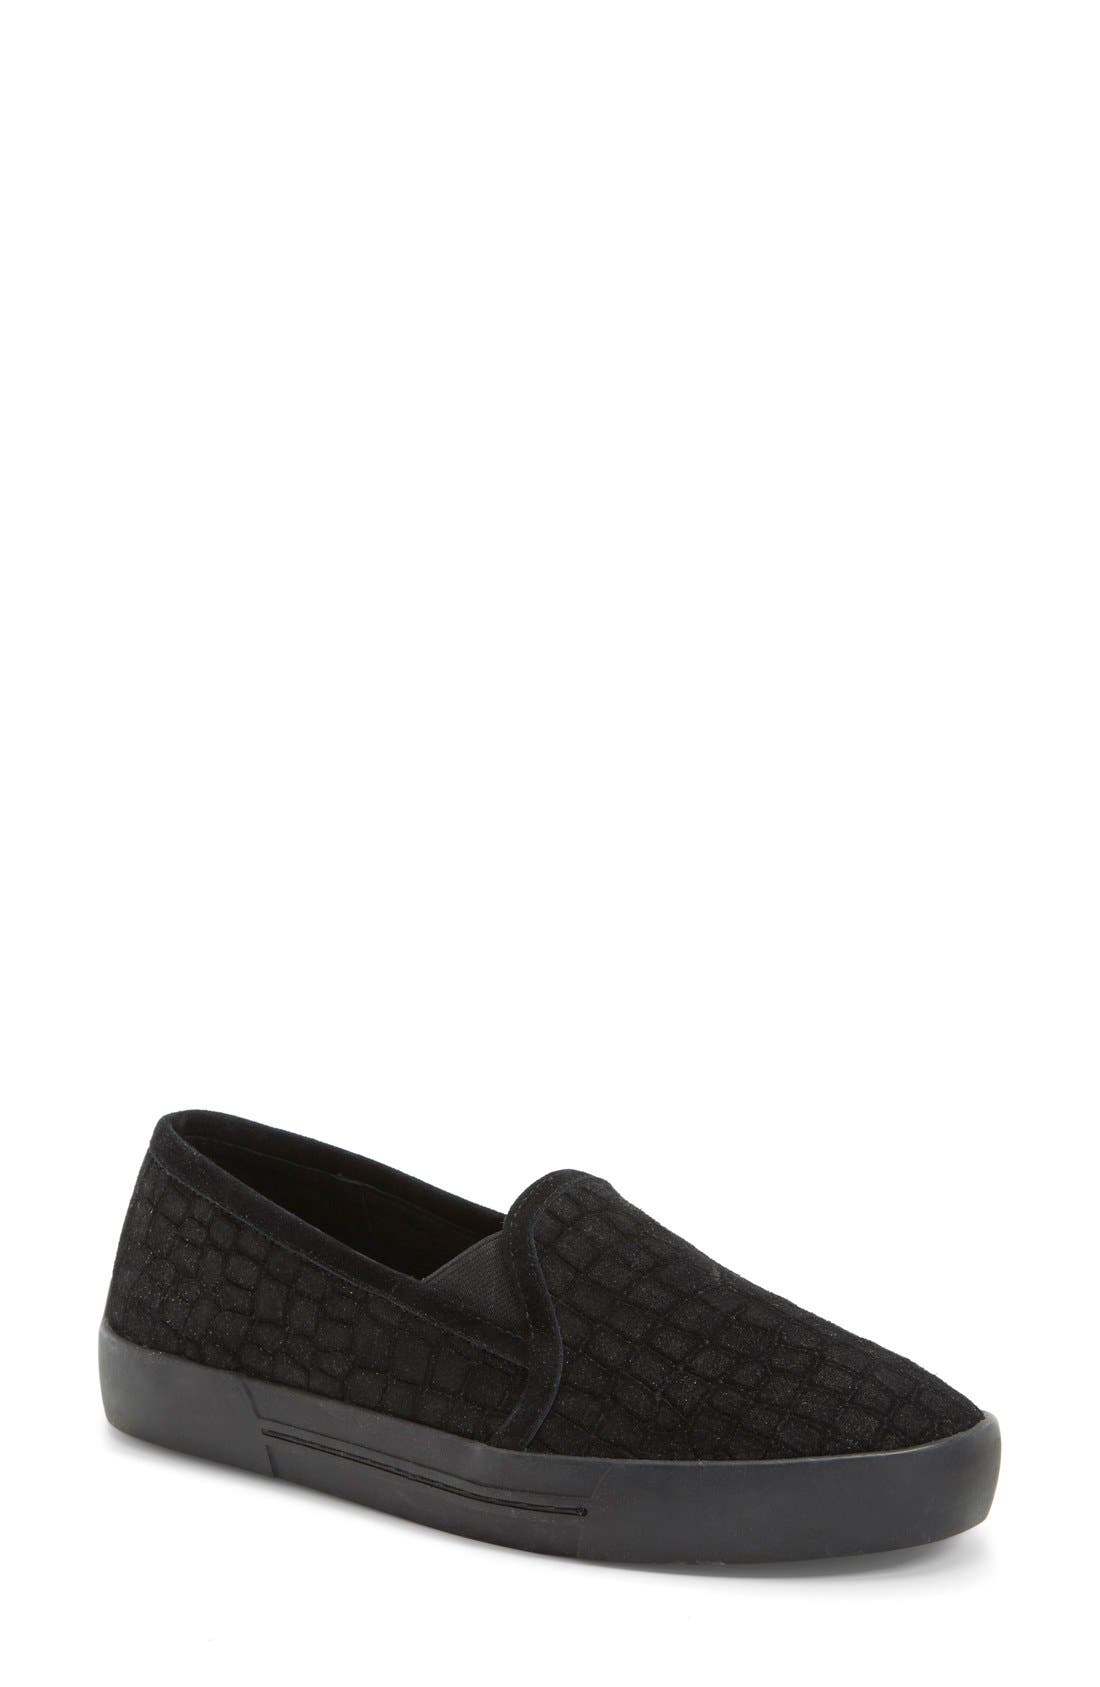 JOIE 'Huxley' Slip-On Sneaker, Main, color, 001